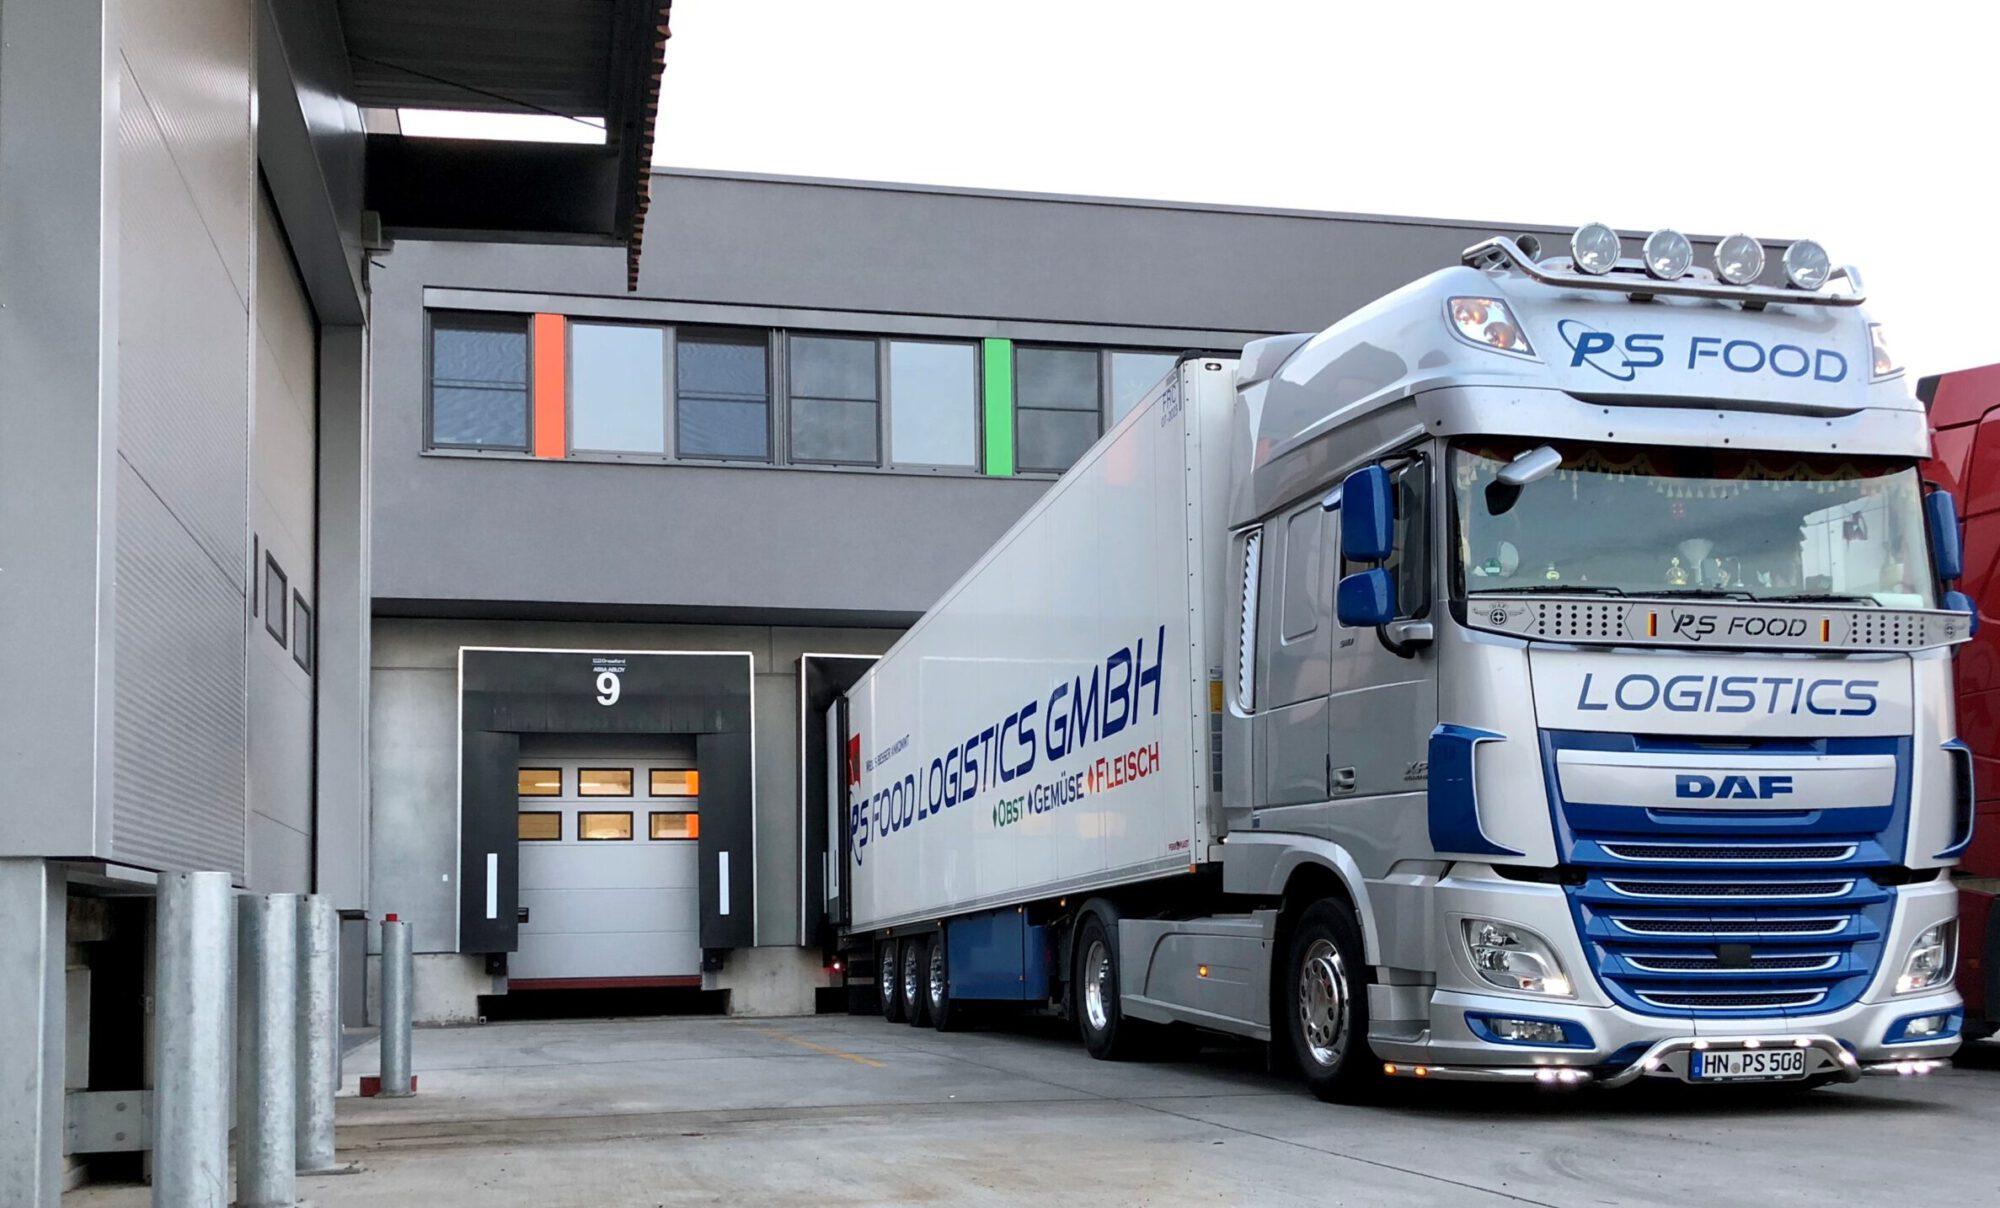 PS Food Logistics GmbH